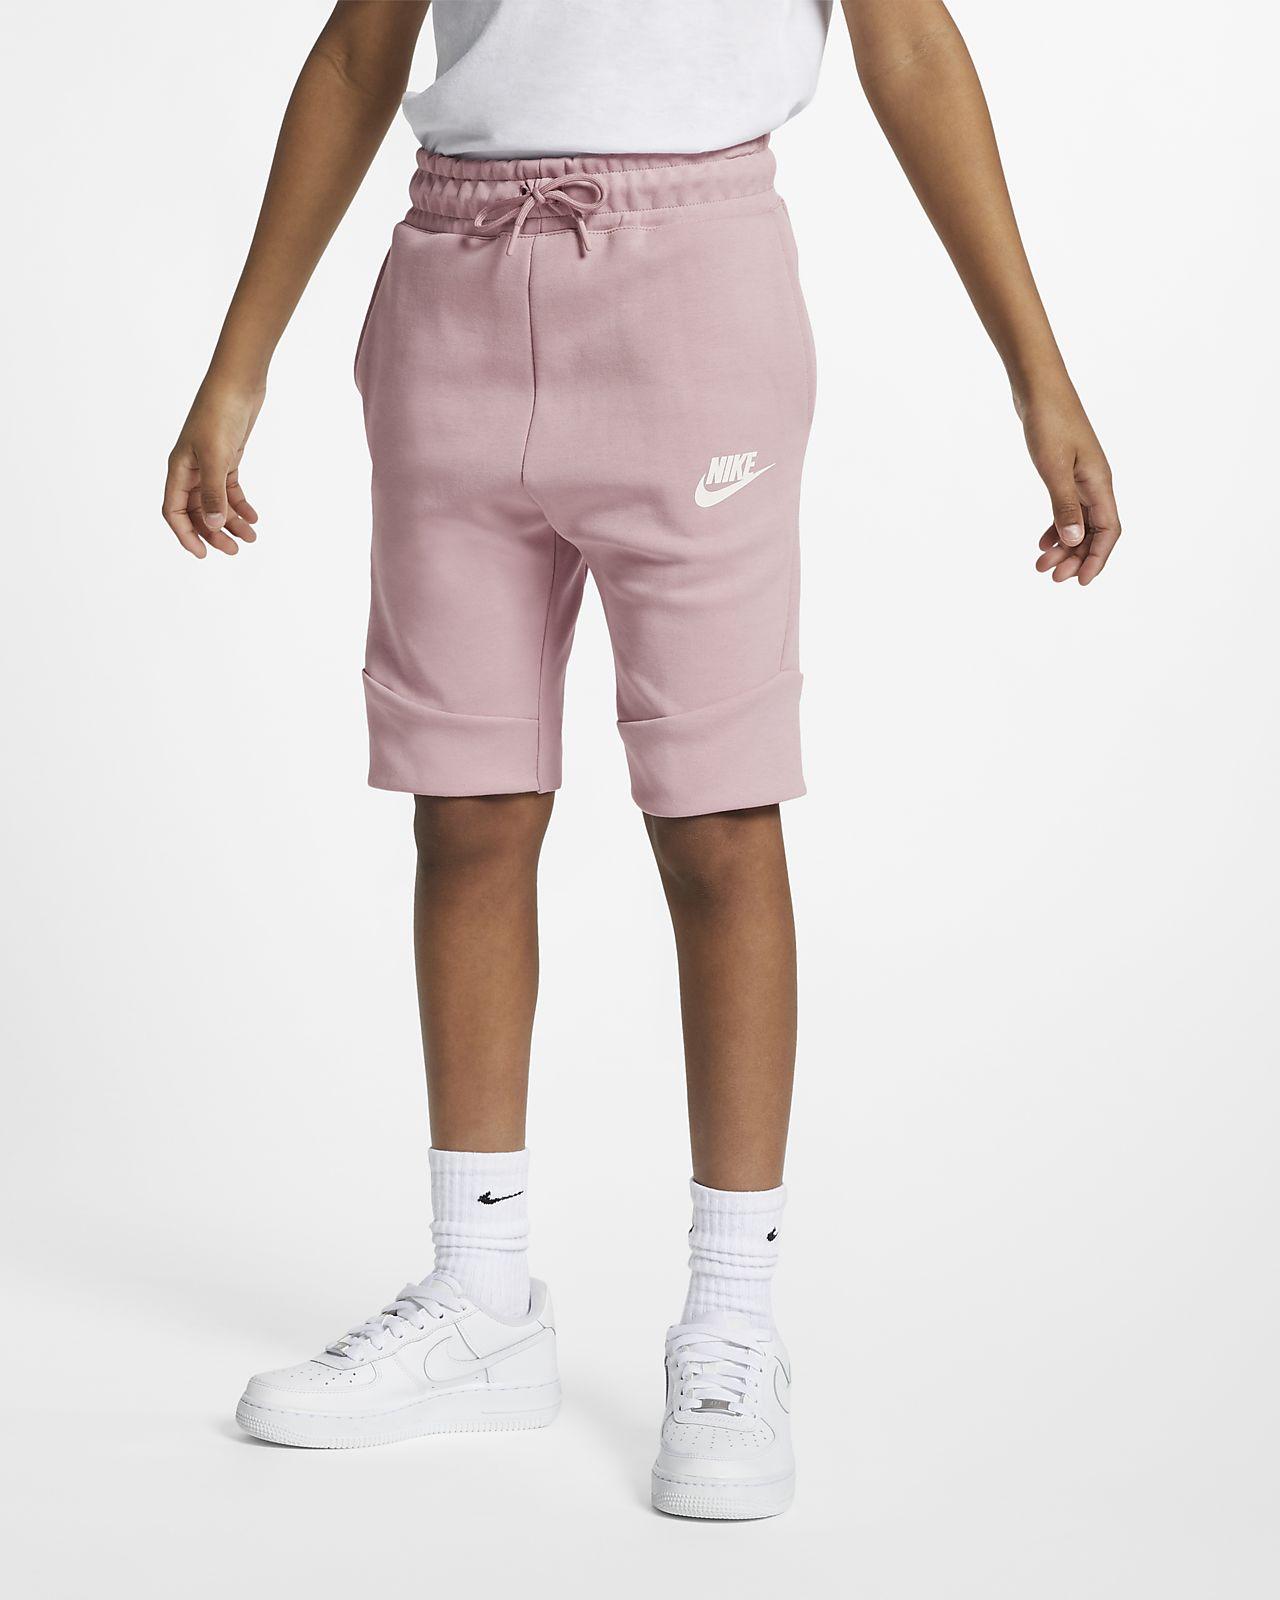 Nike Sportswear Tech Fleece rövidnadrág nagyobb gyerekeknek